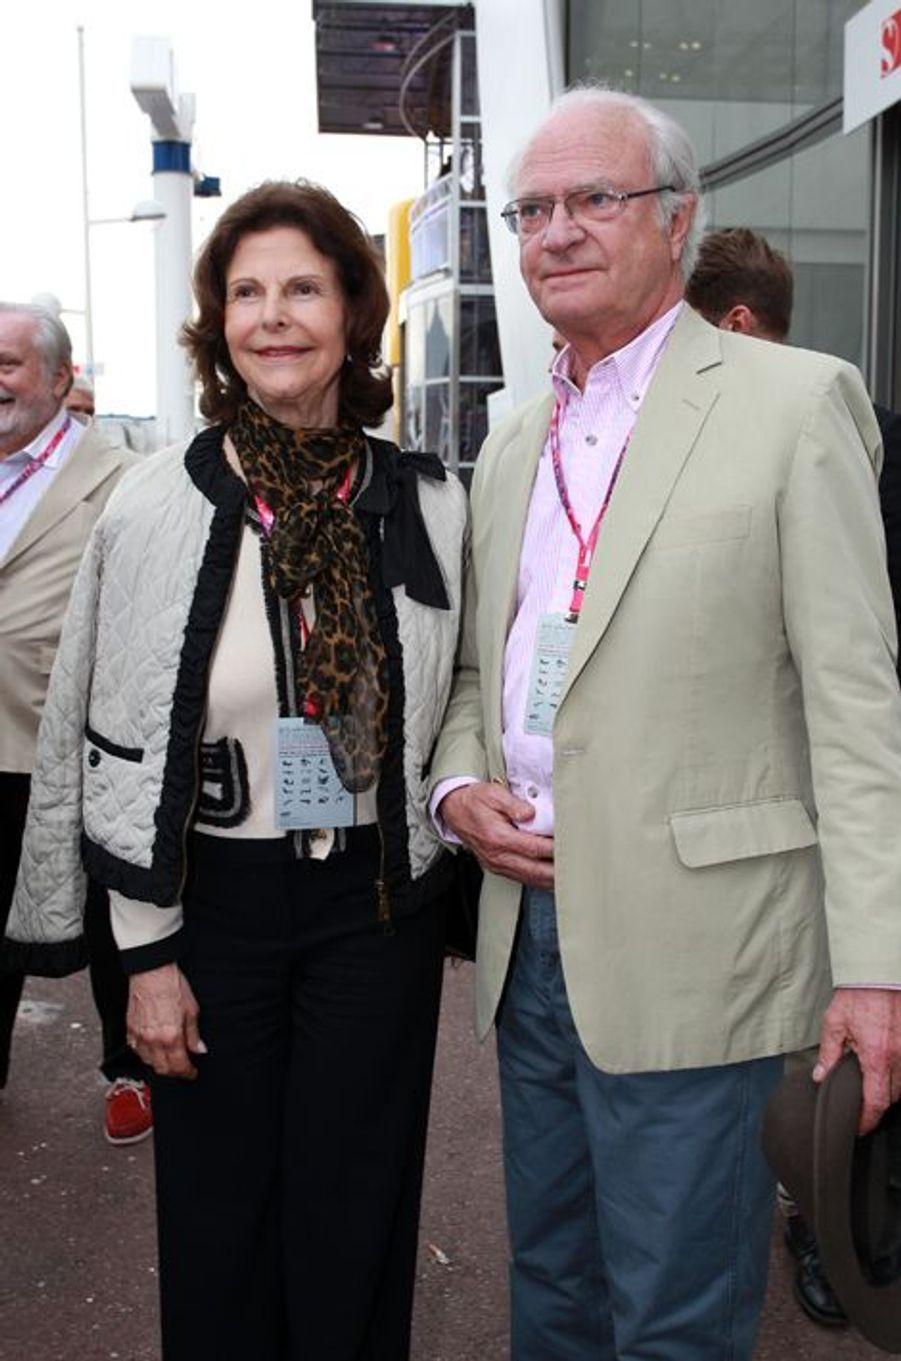 La reine Silvia et le roi Carl XVI Gustaf de Suède au Grand Prix de Monaco, le 23 mai 2015